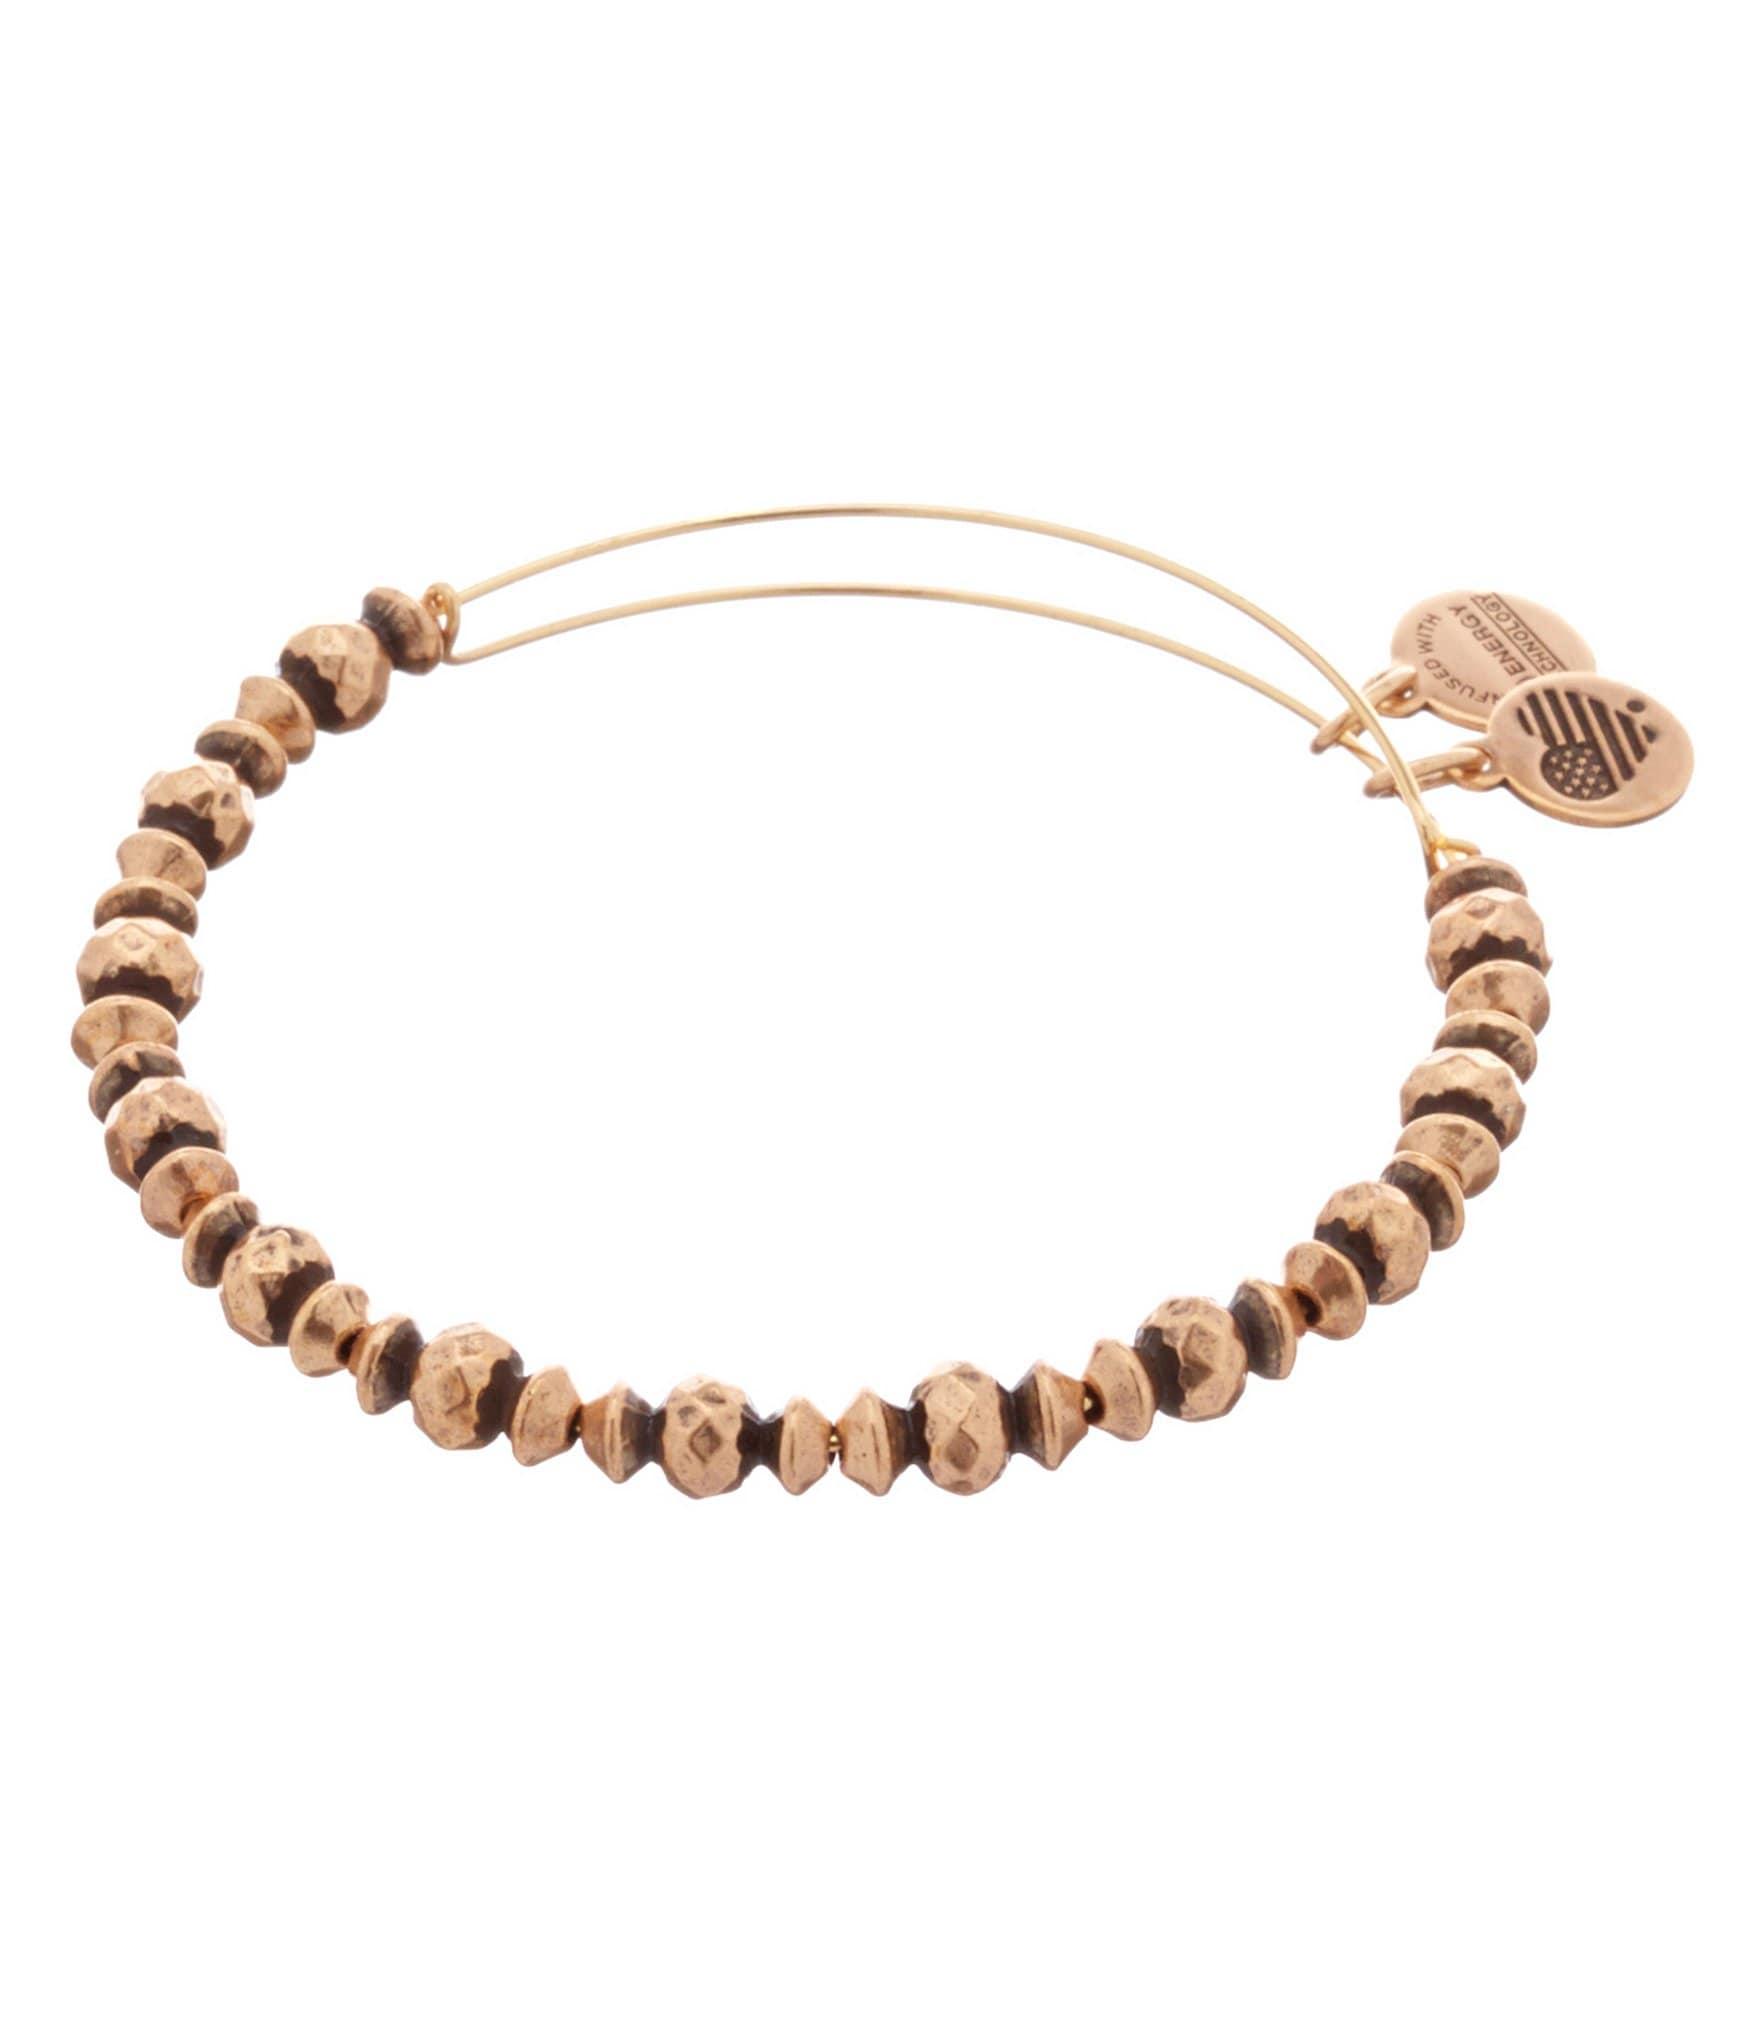 Pandora bracelet dillards - Pandora Bracelet Dillards 46